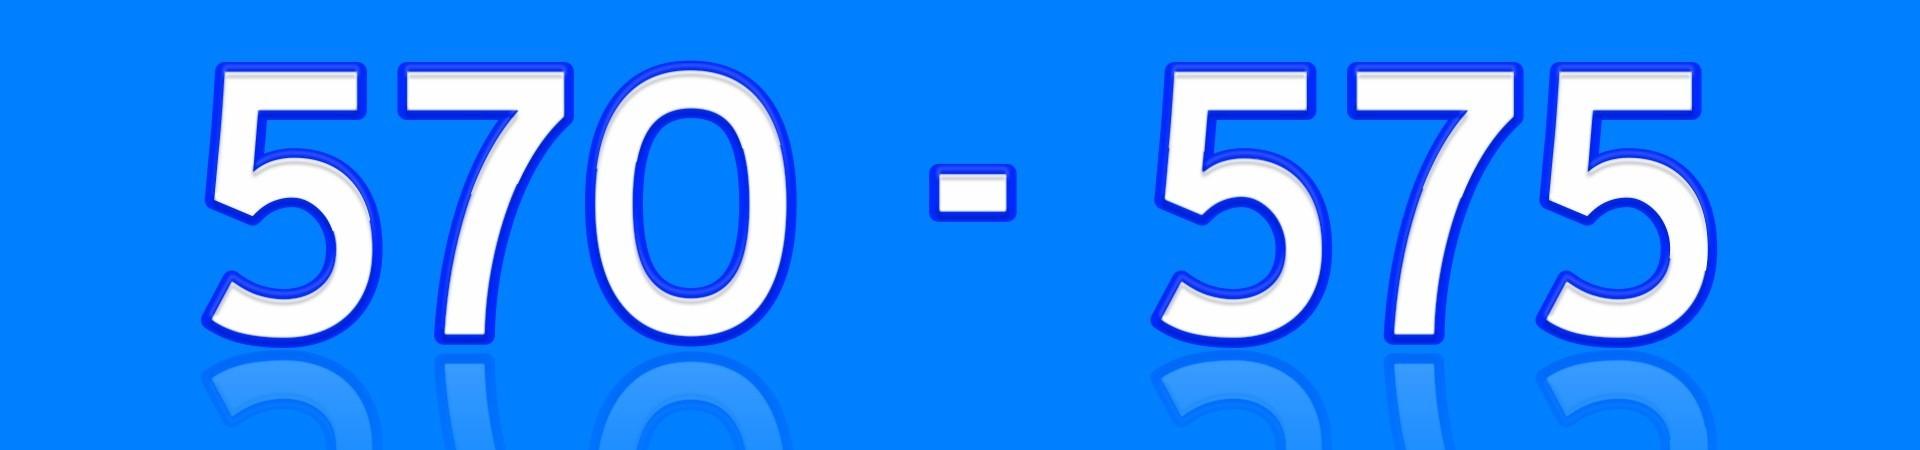 REPUESTOS para Motosierra HUSQVARNA 570 575